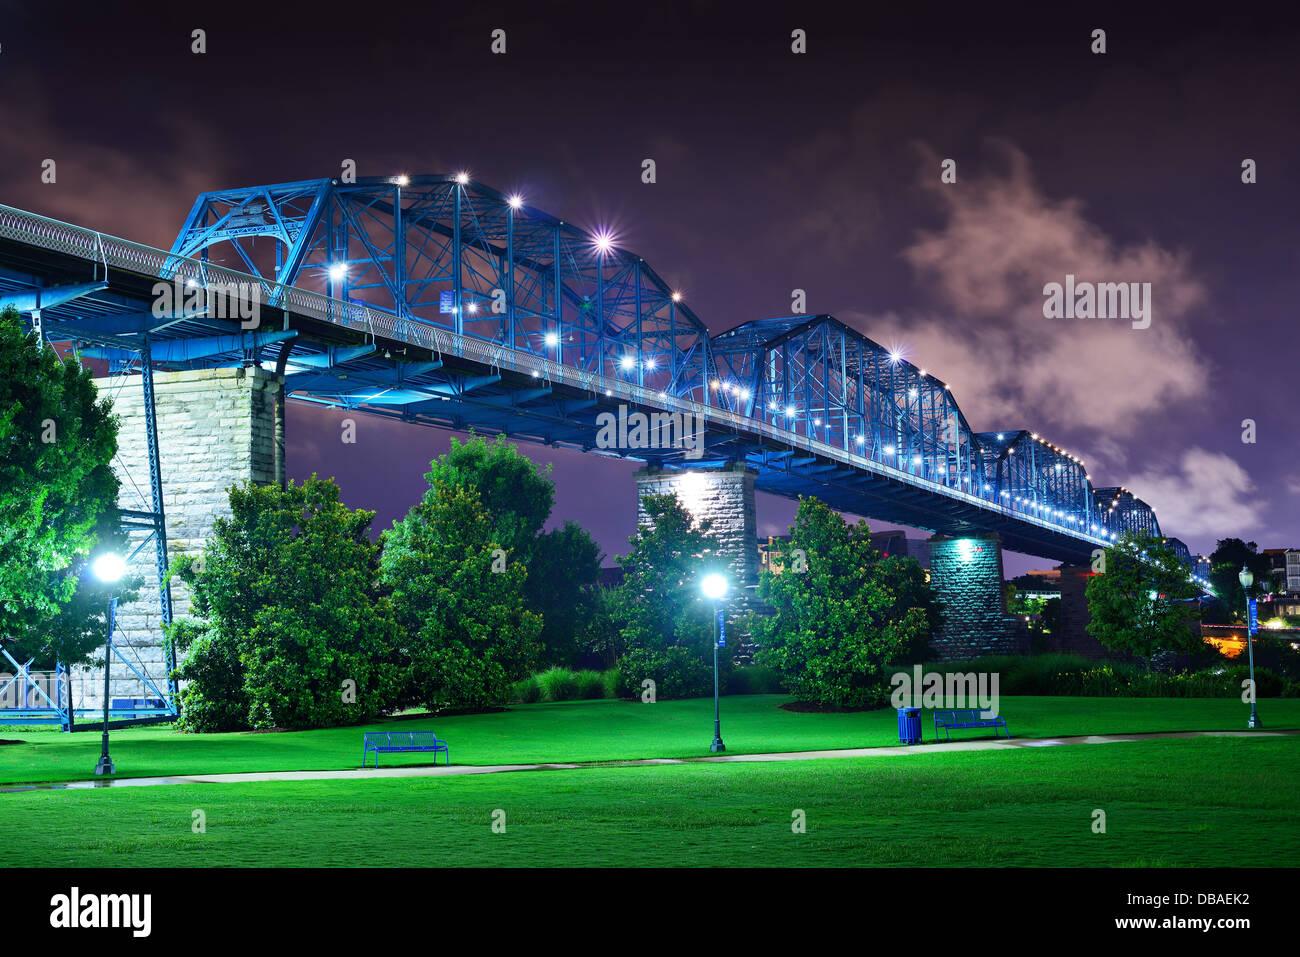 Walnut Street Bridge over Coolidge Park in Chattanooga, Tennessee. - Stock Image